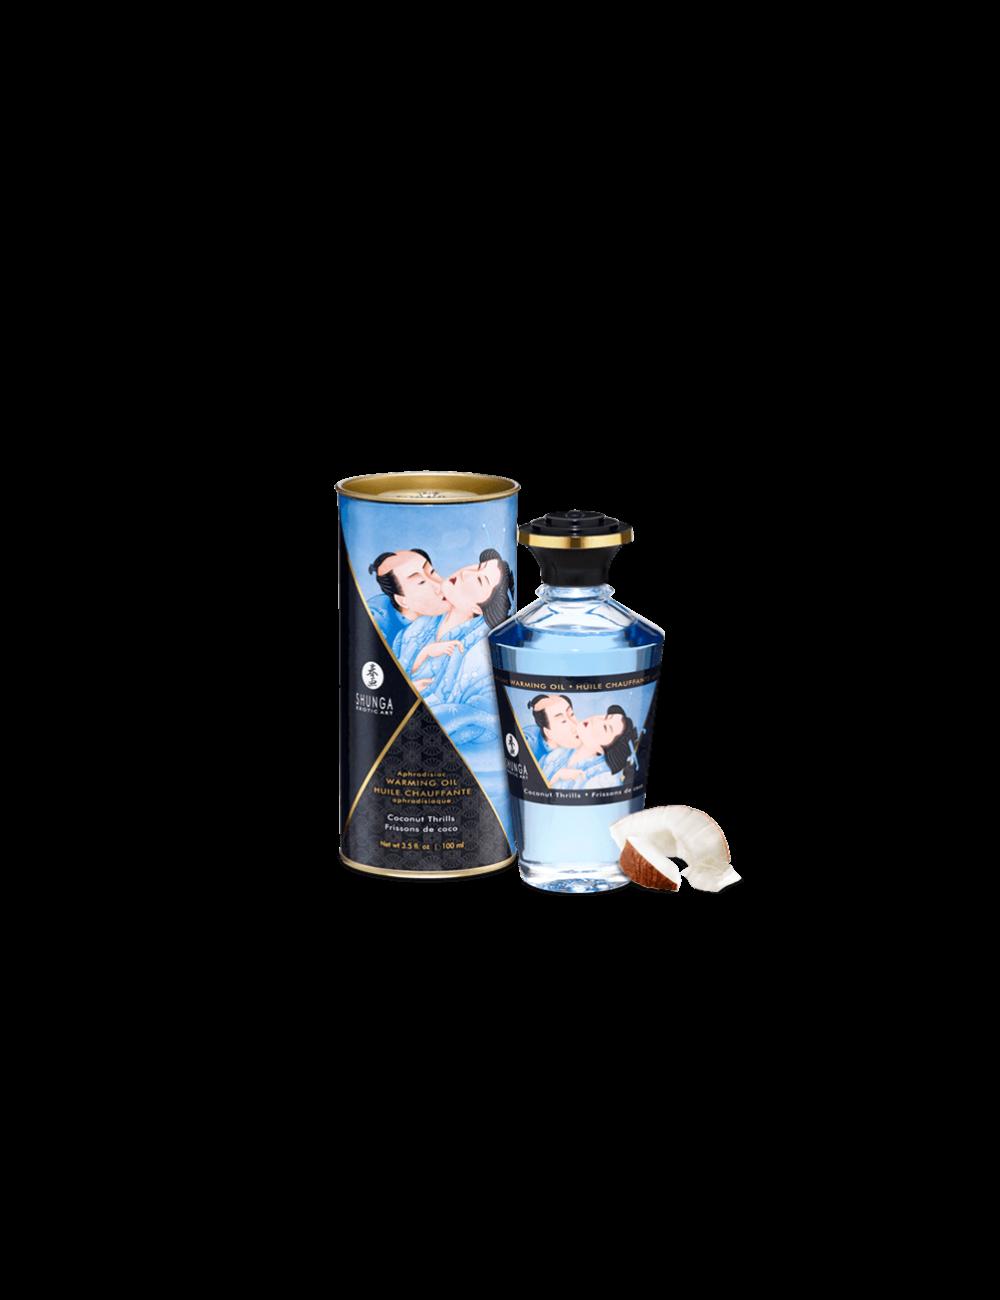 Huile chauffante aphrodisiaque - Frissons de coco 100ml - Huiles de massage - Shunga